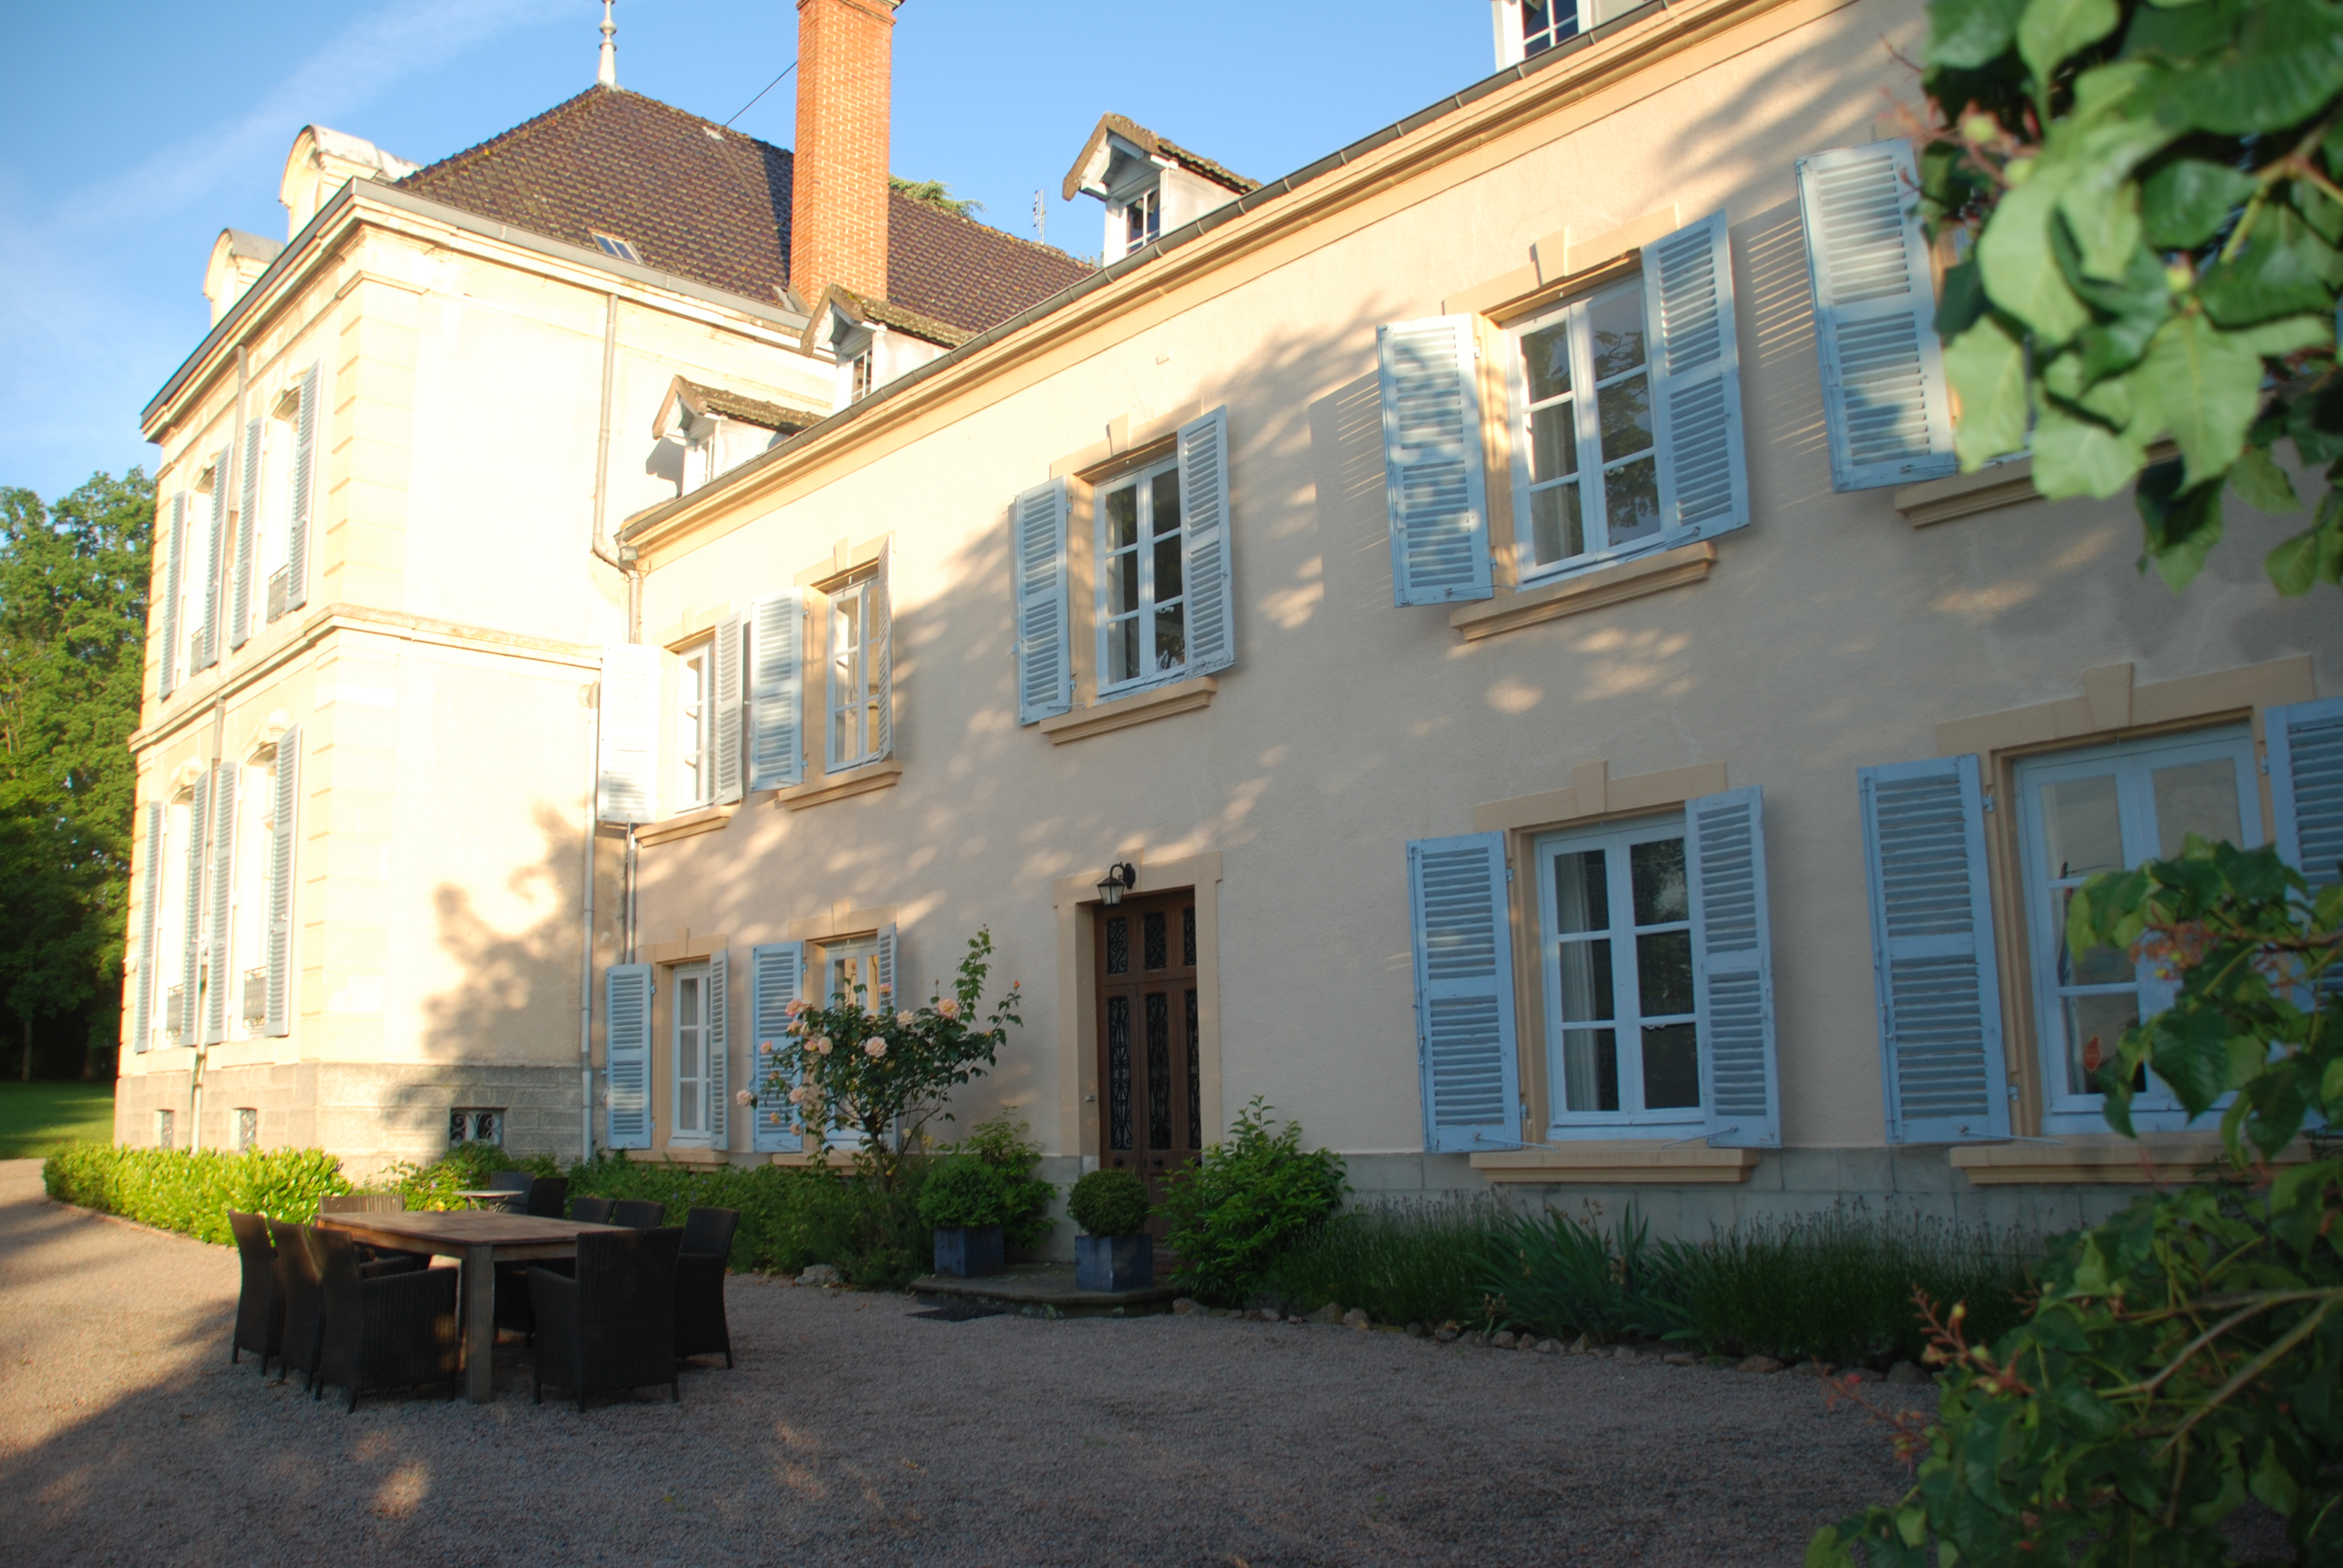 Maison Les Bardons and the terras